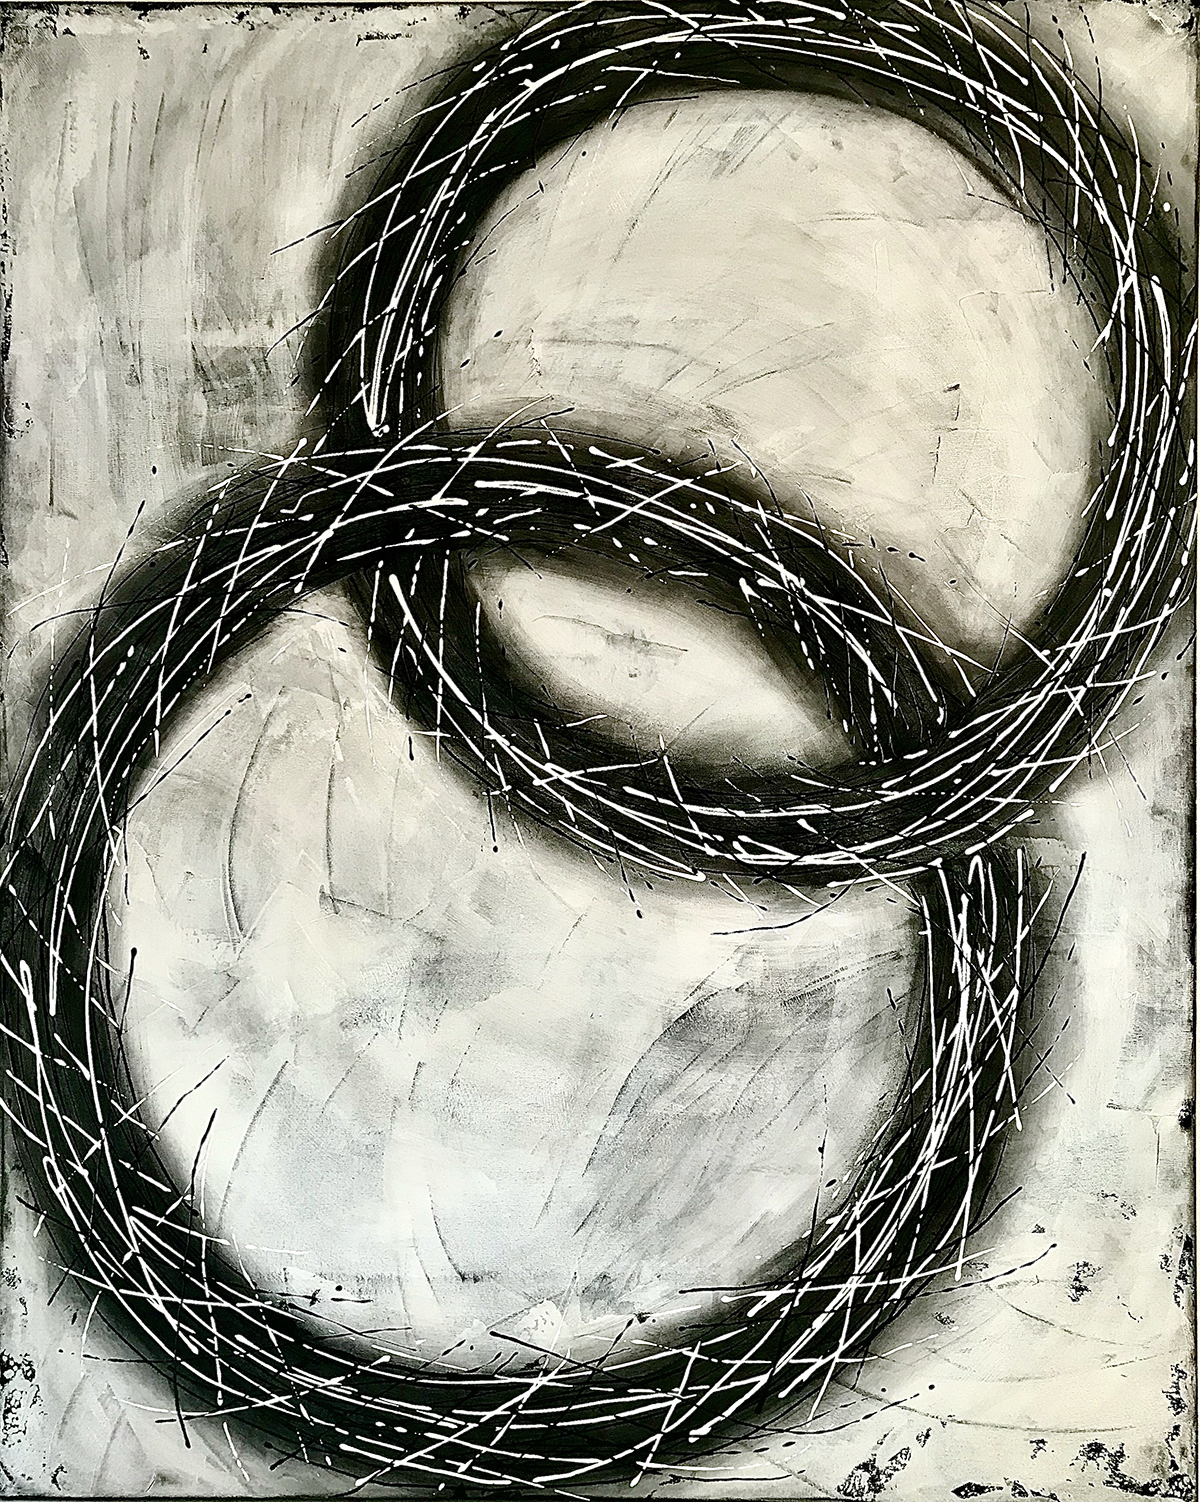 Cerchi di Vita by Cinzia Ferda 60x48x2